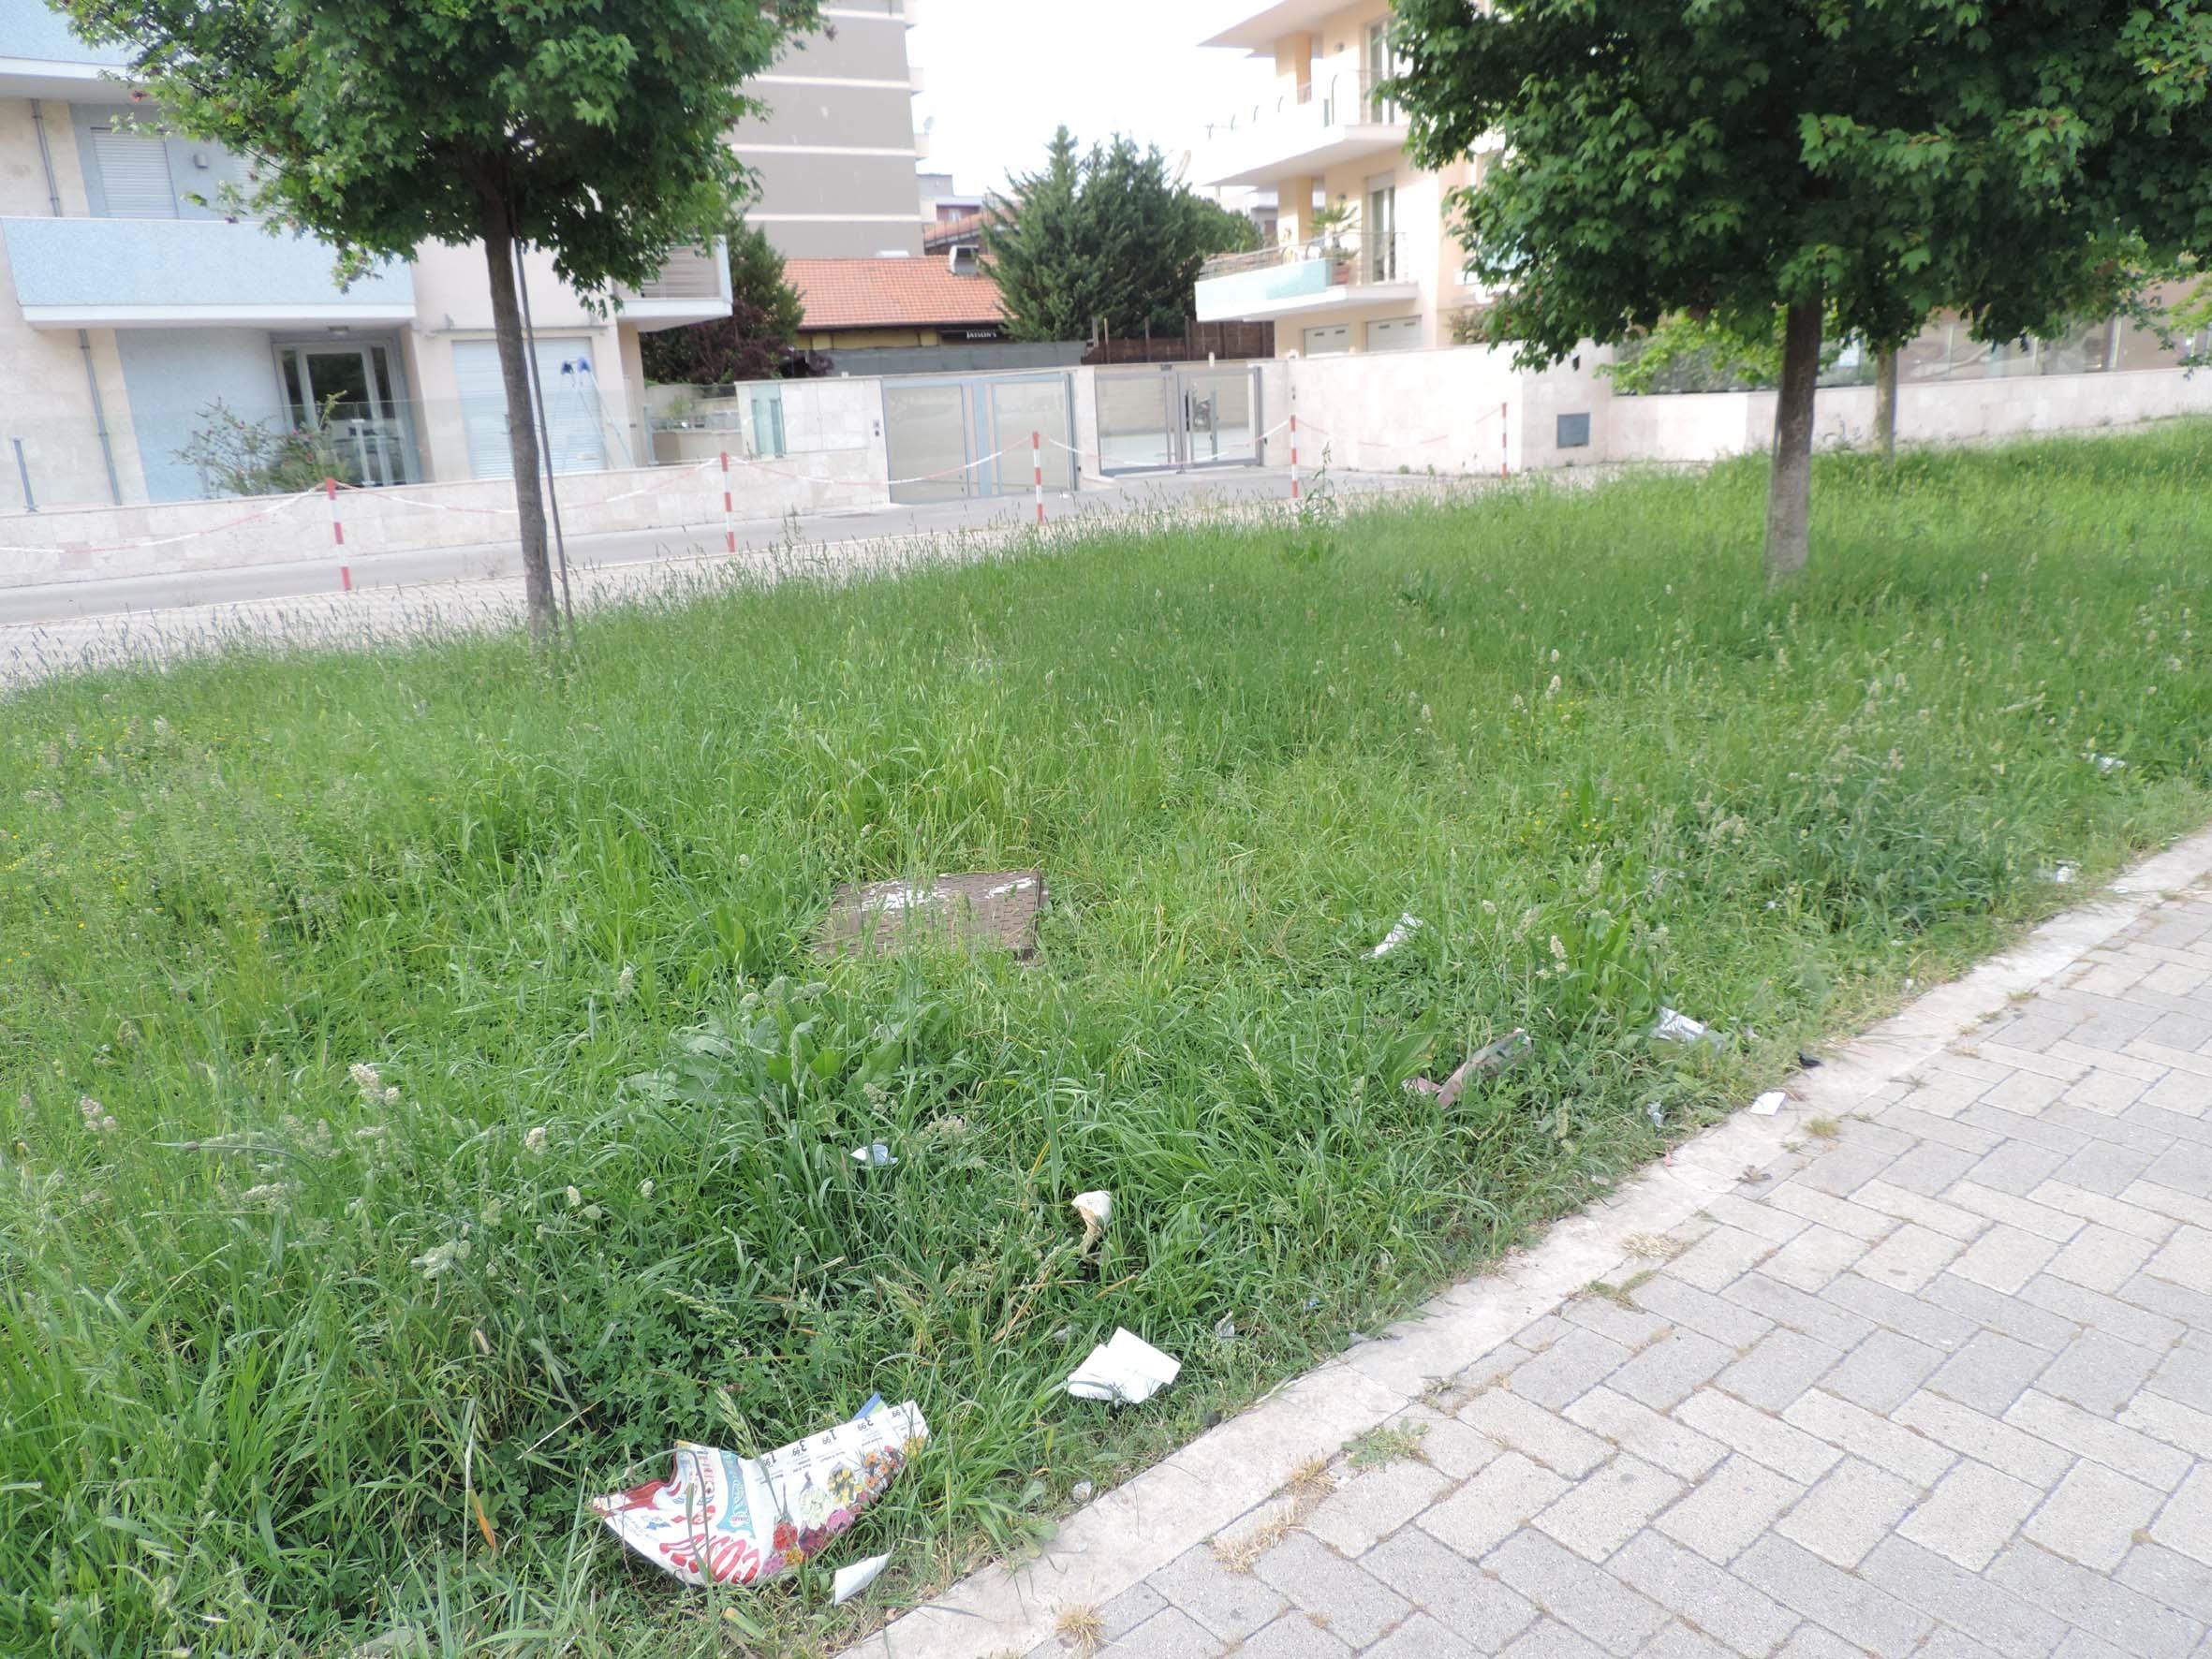 F.I. sollecita cura del verde in Via D'Ascanio